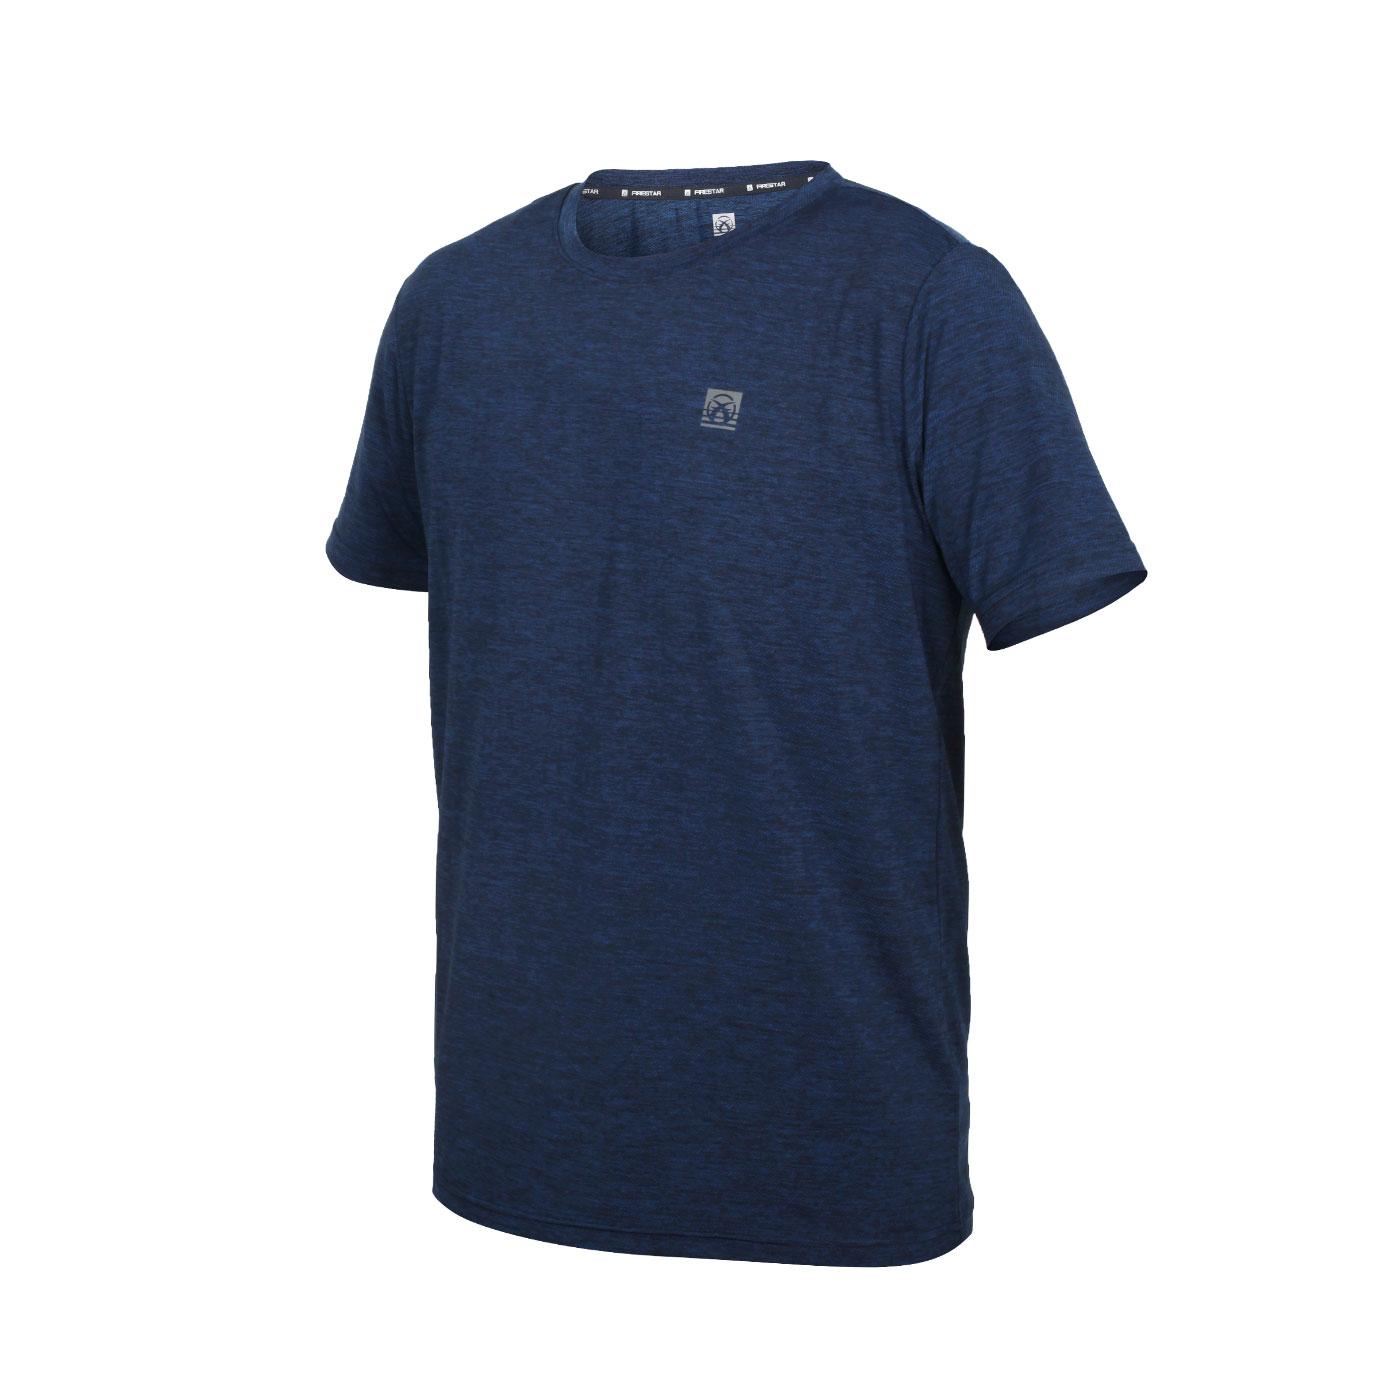 FIRESTAR 男款彈性機能圓領T恤 D1731-93 - 丈青銀